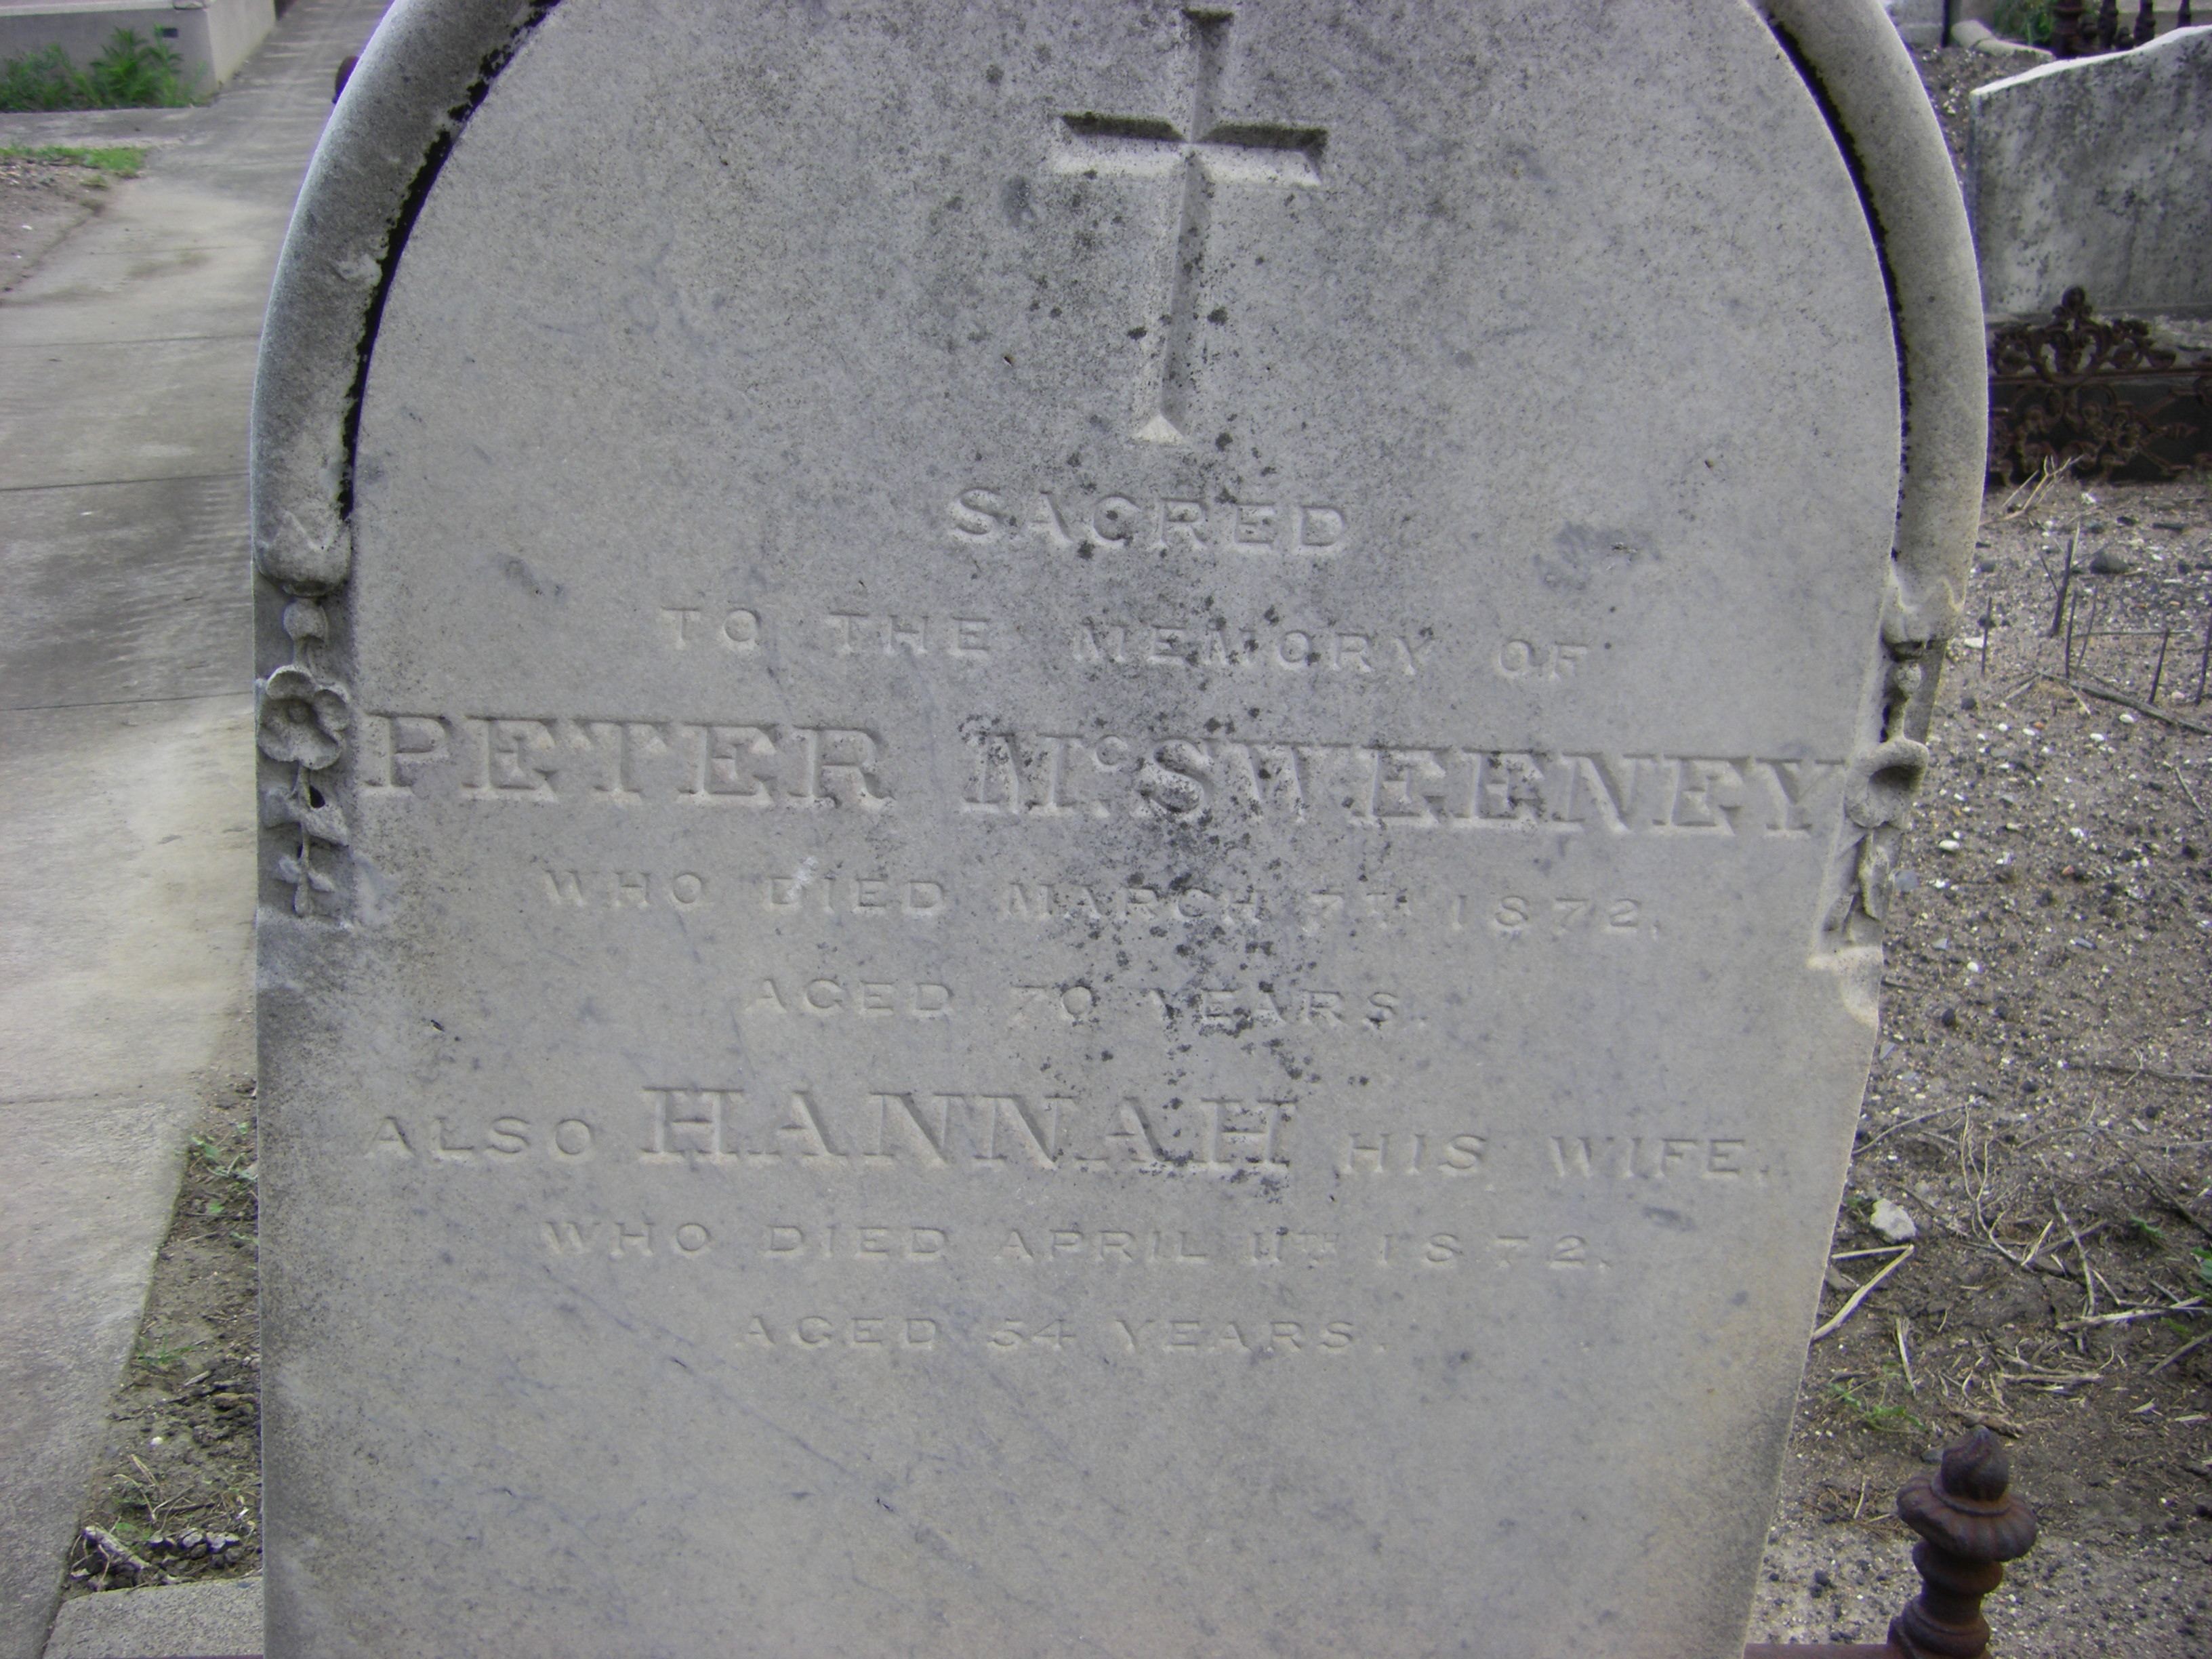 Peter & Hannah McSweeney 1872 Melb Gen Cem.